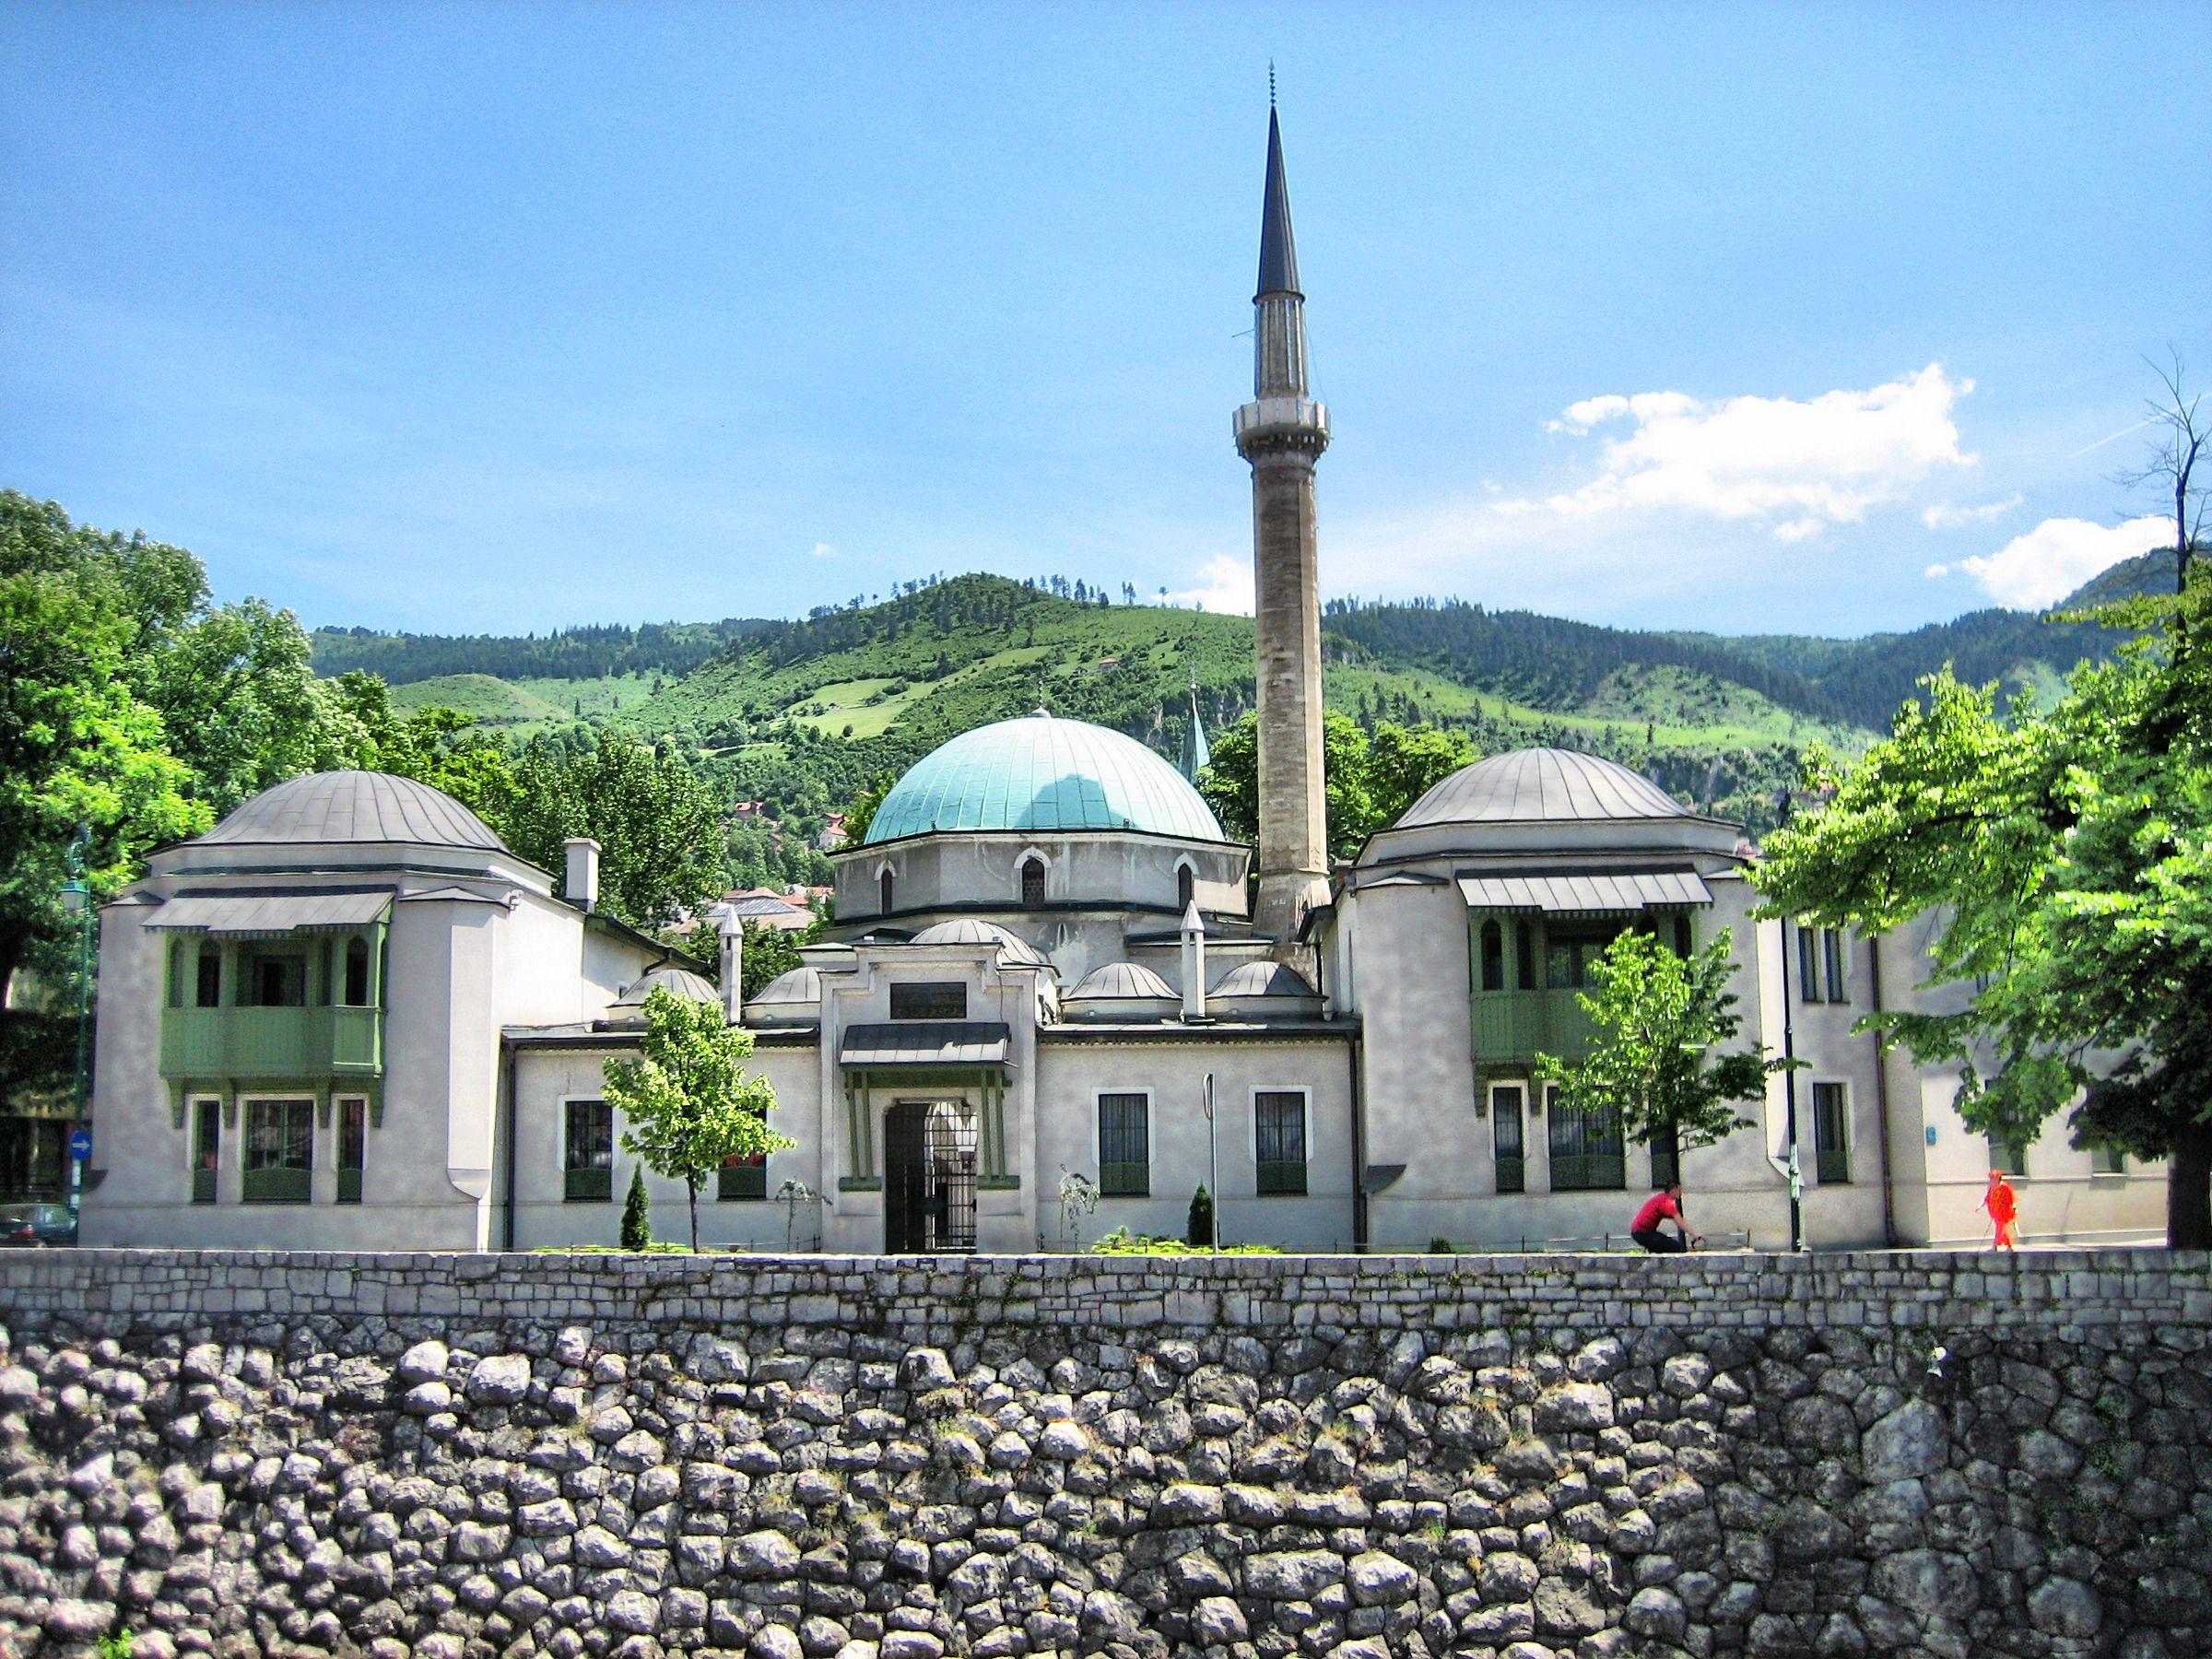 Emperor mosque in sarajevo bosnia herzegovina masjidsmosques emperor mosque in sarajevo bosnia herzegovina altavistaventures Image collections